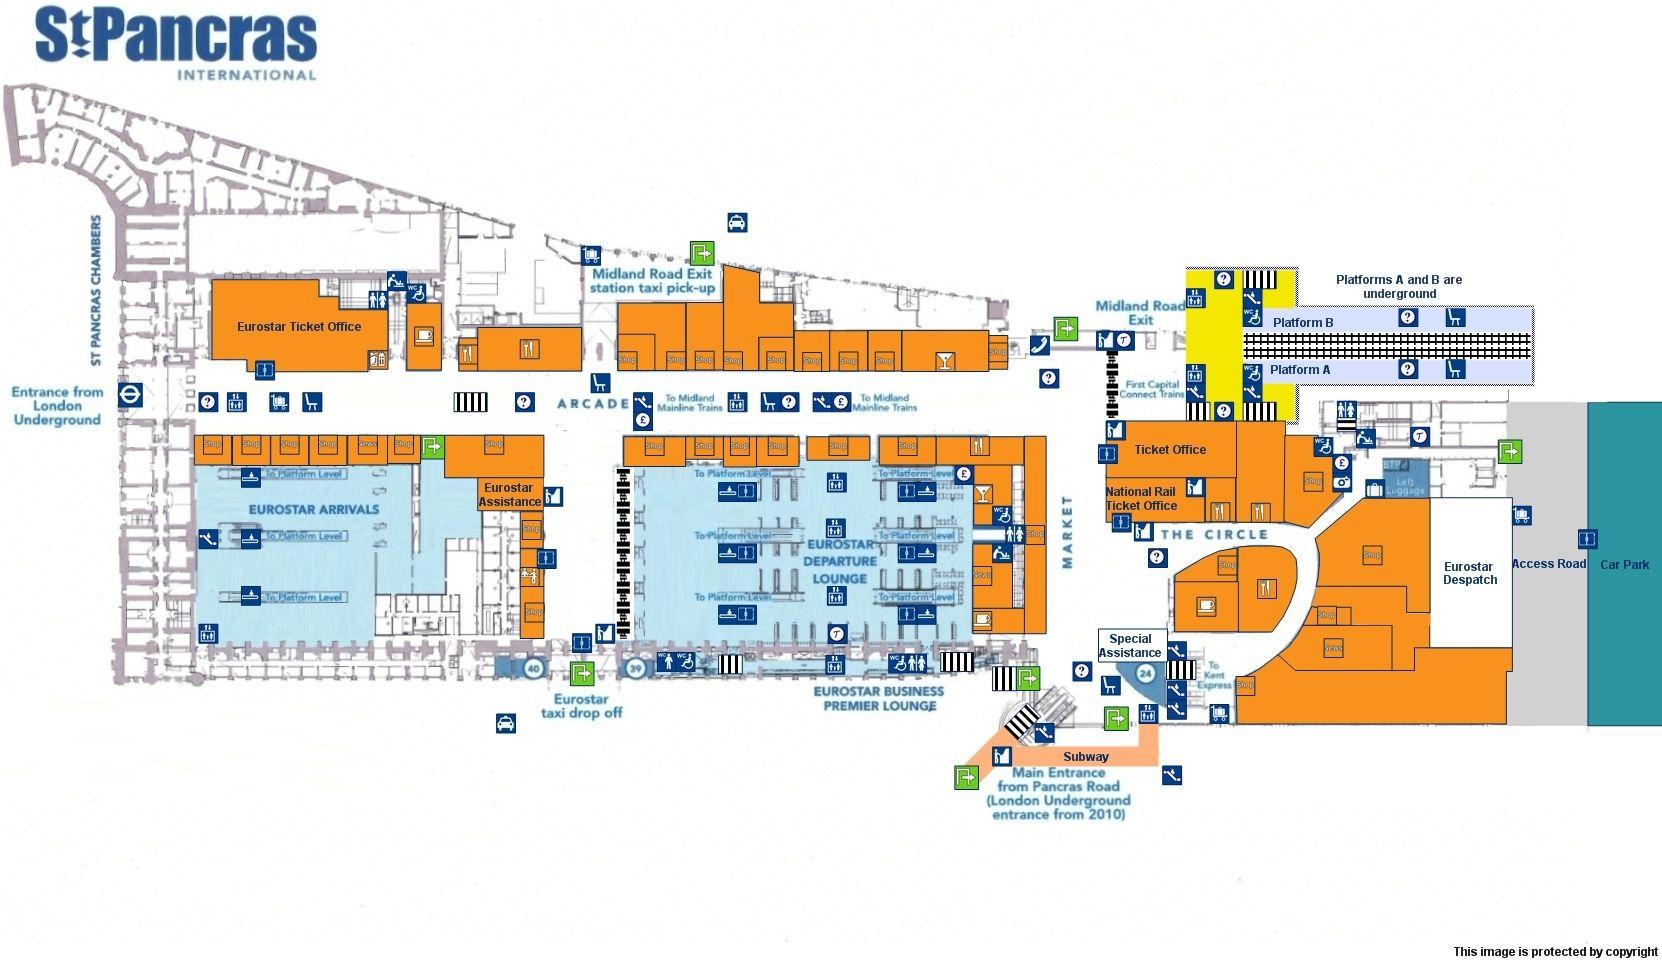 st pancras london map Map Of London St Pancras International Station National Rail Uk